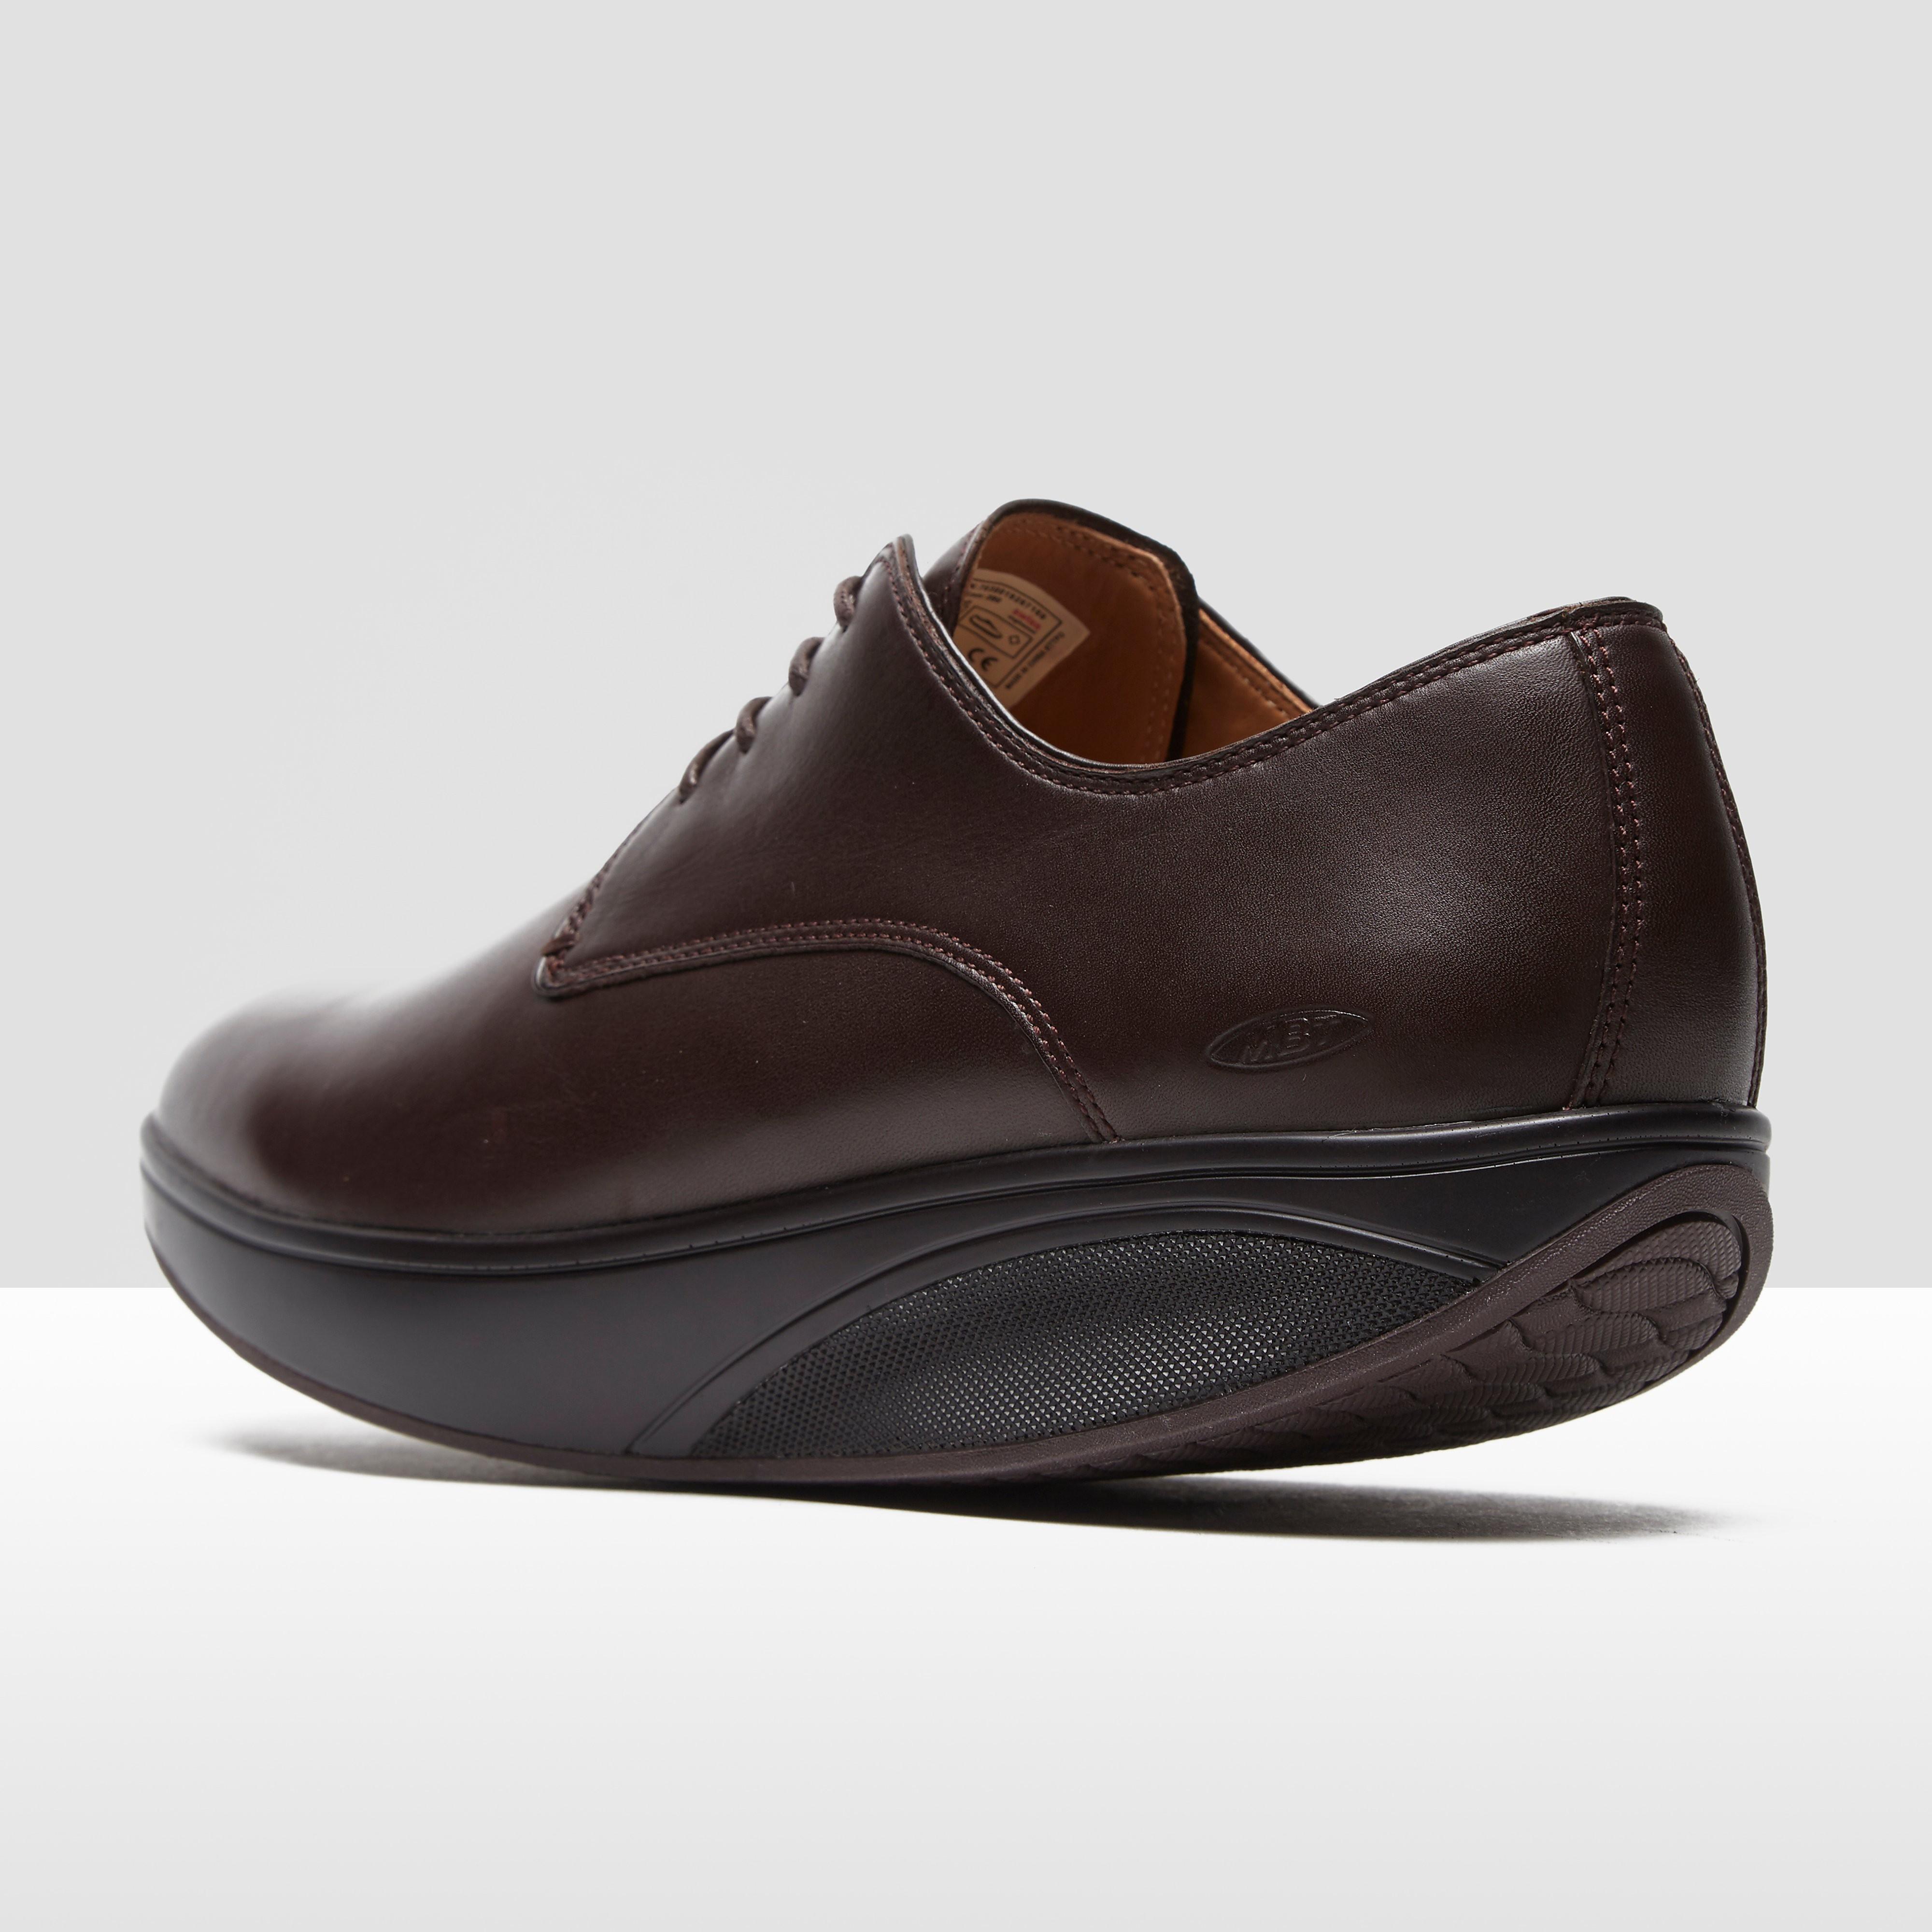 MBT Kabisa 5 Men's Walking Shoes